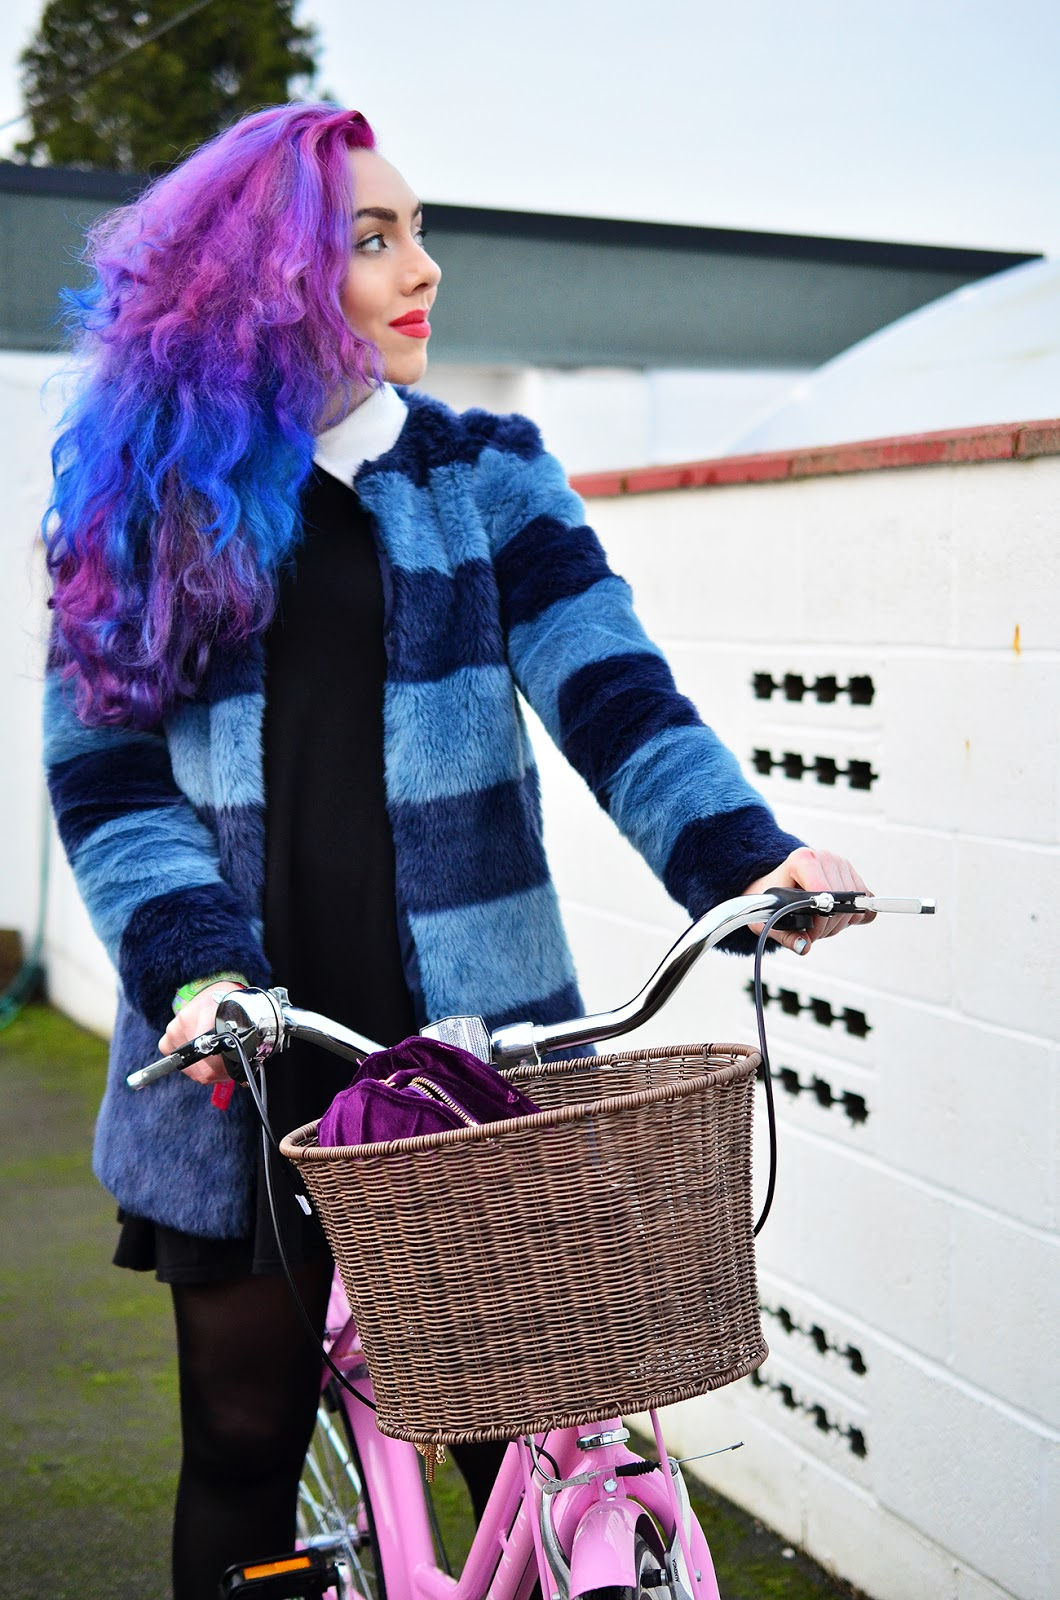 Pink purple blue hair fashion beauty blogger